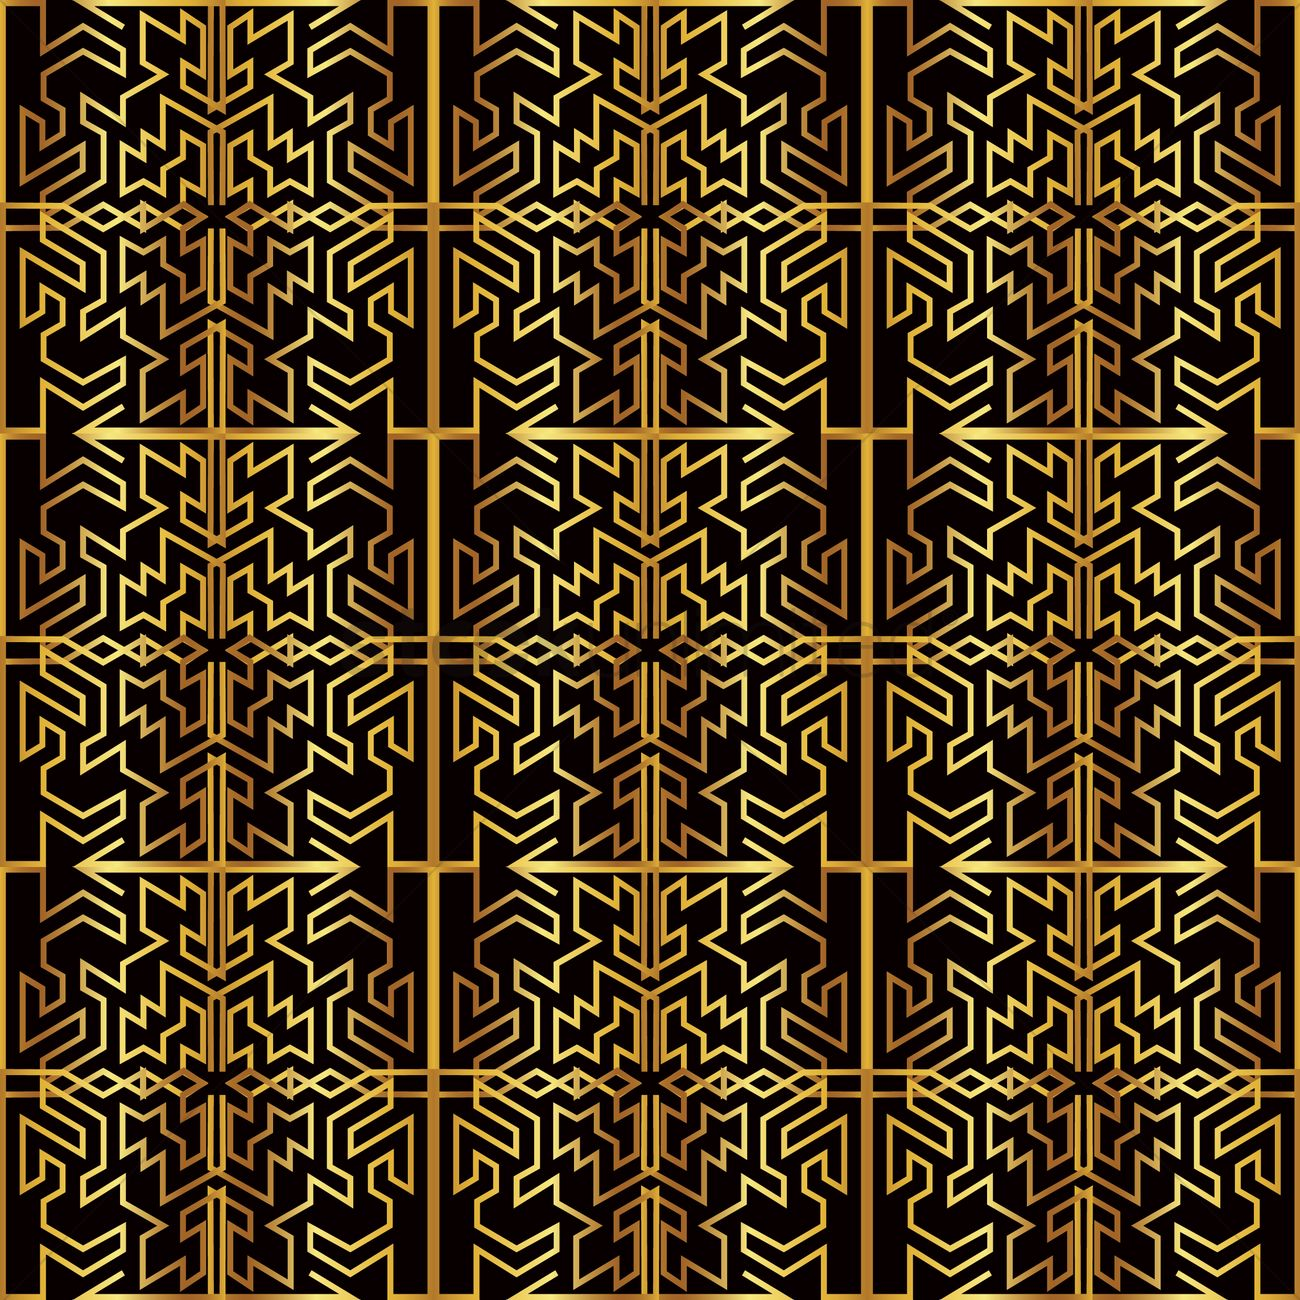 Black And Golden Wallpaper Vector Image 1821380 Stockunlimited